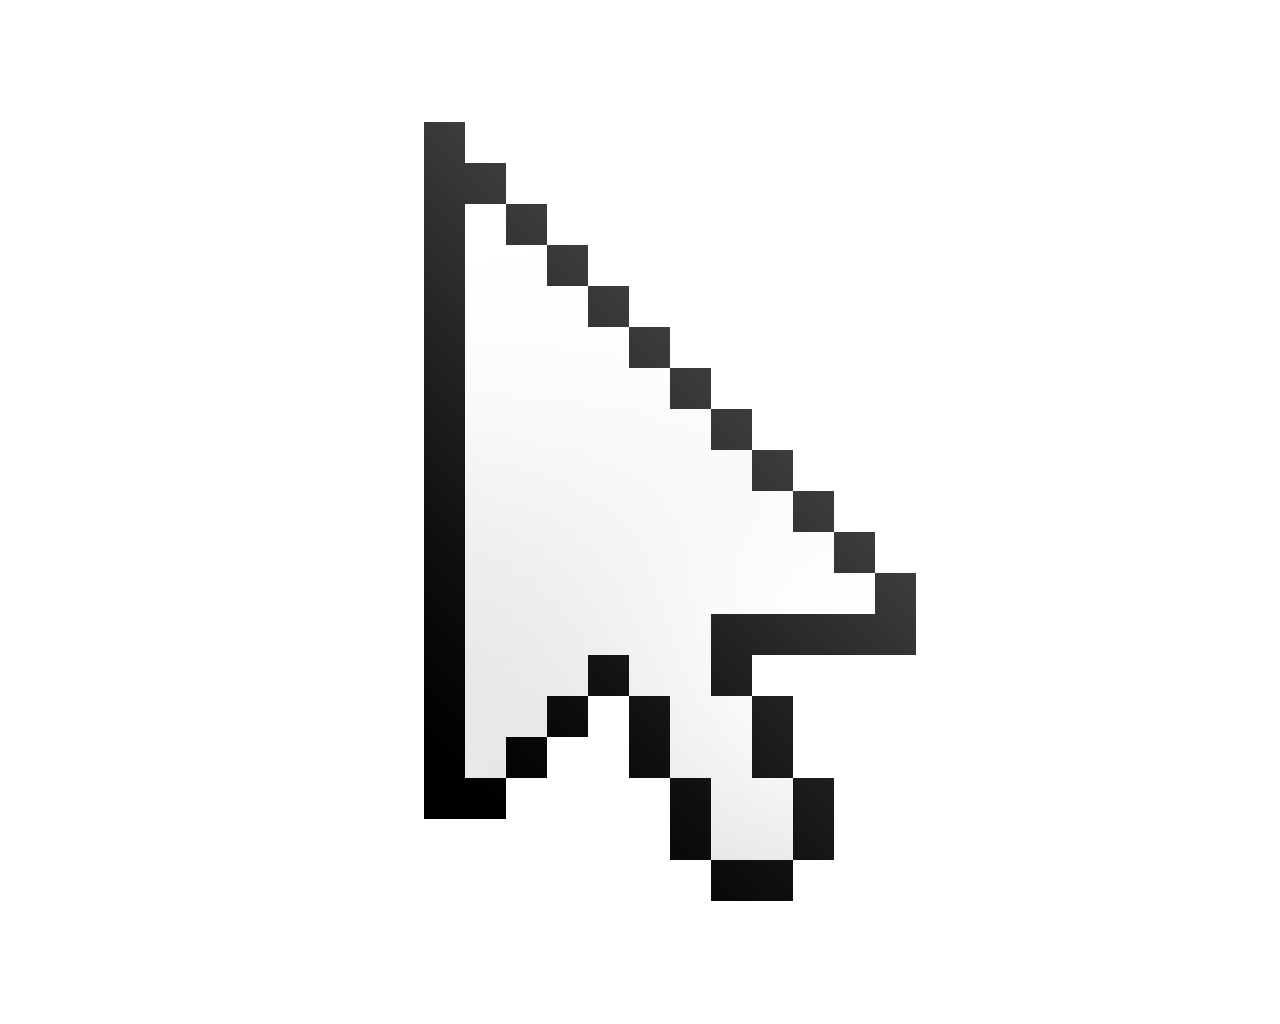 arrow on computer